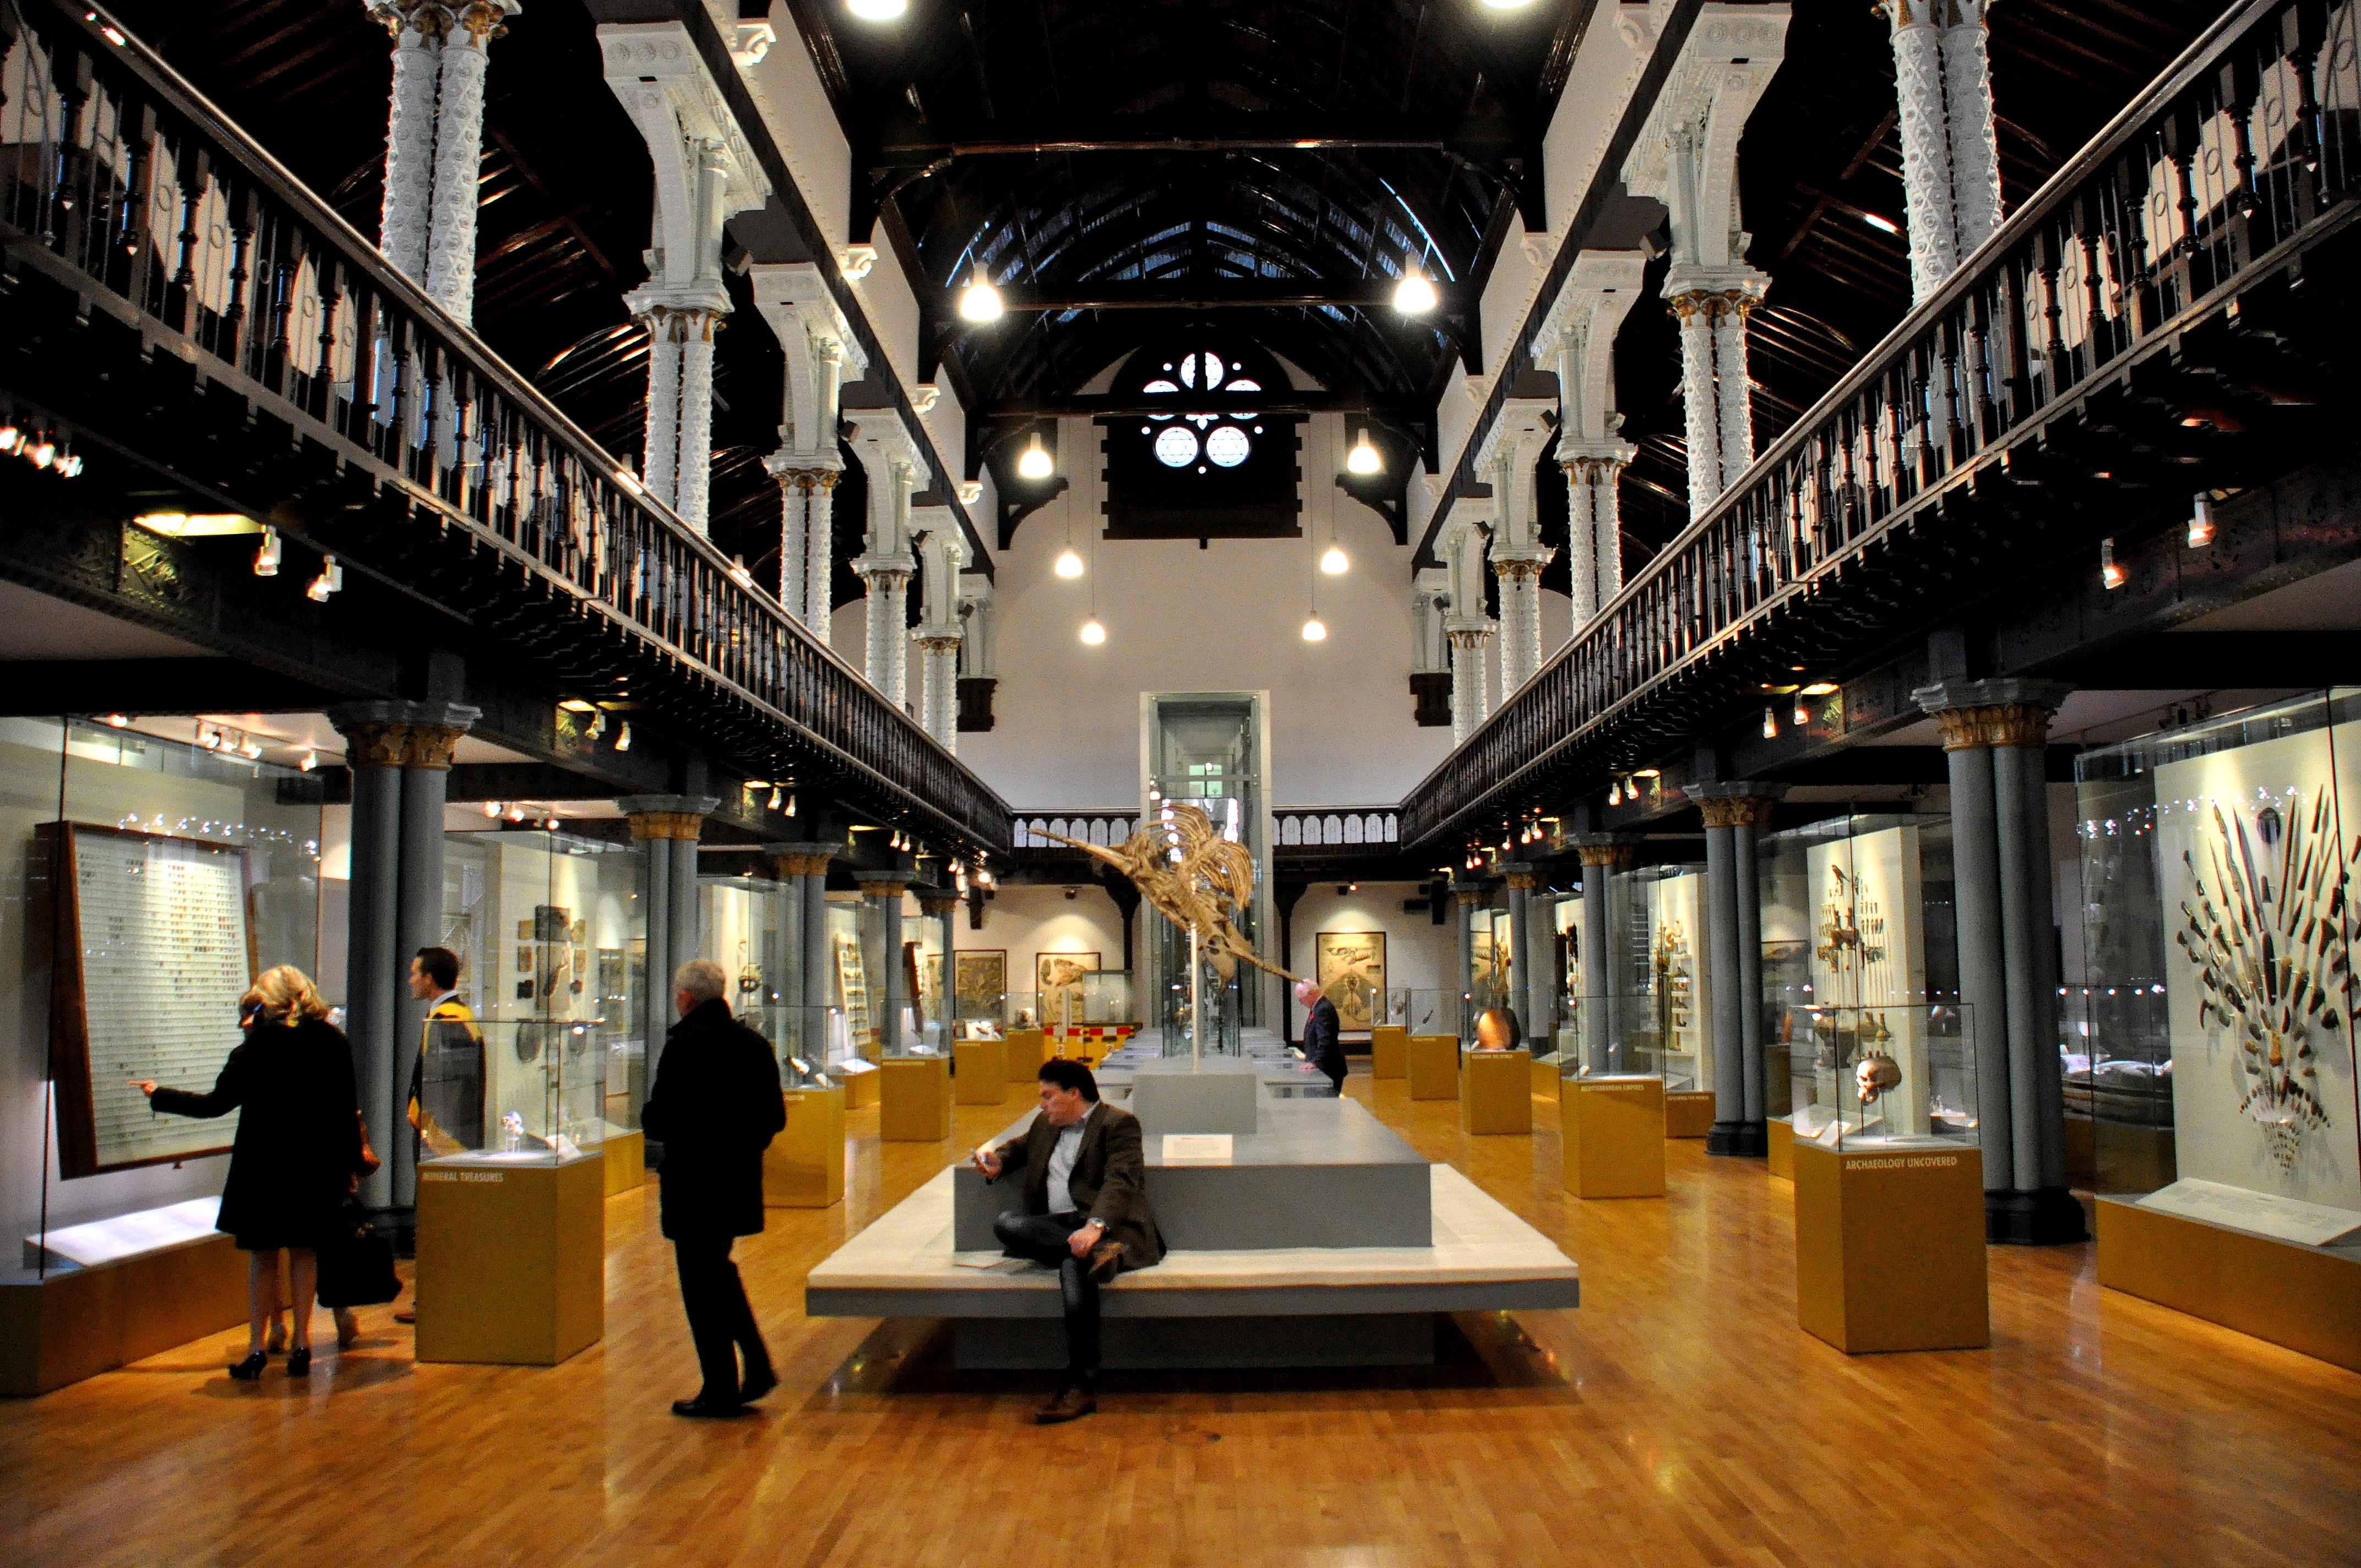 Edinburgh Anatomy Museum